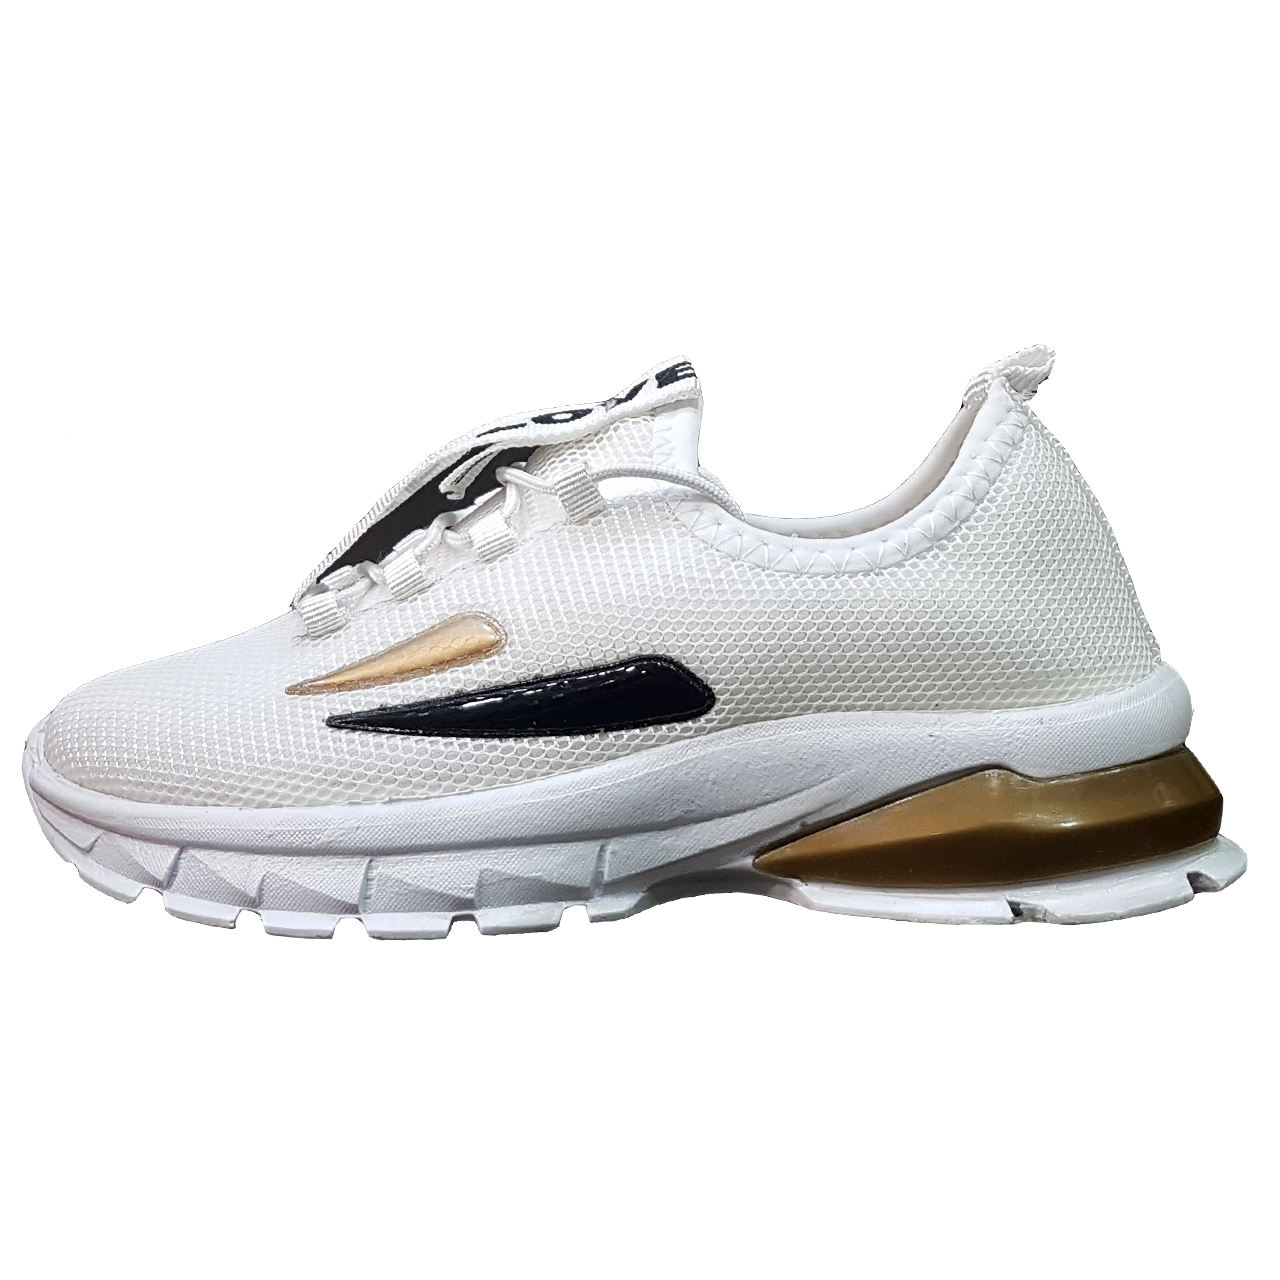 کفش پیاده روی پسرانه کد 3328090 -  - 3